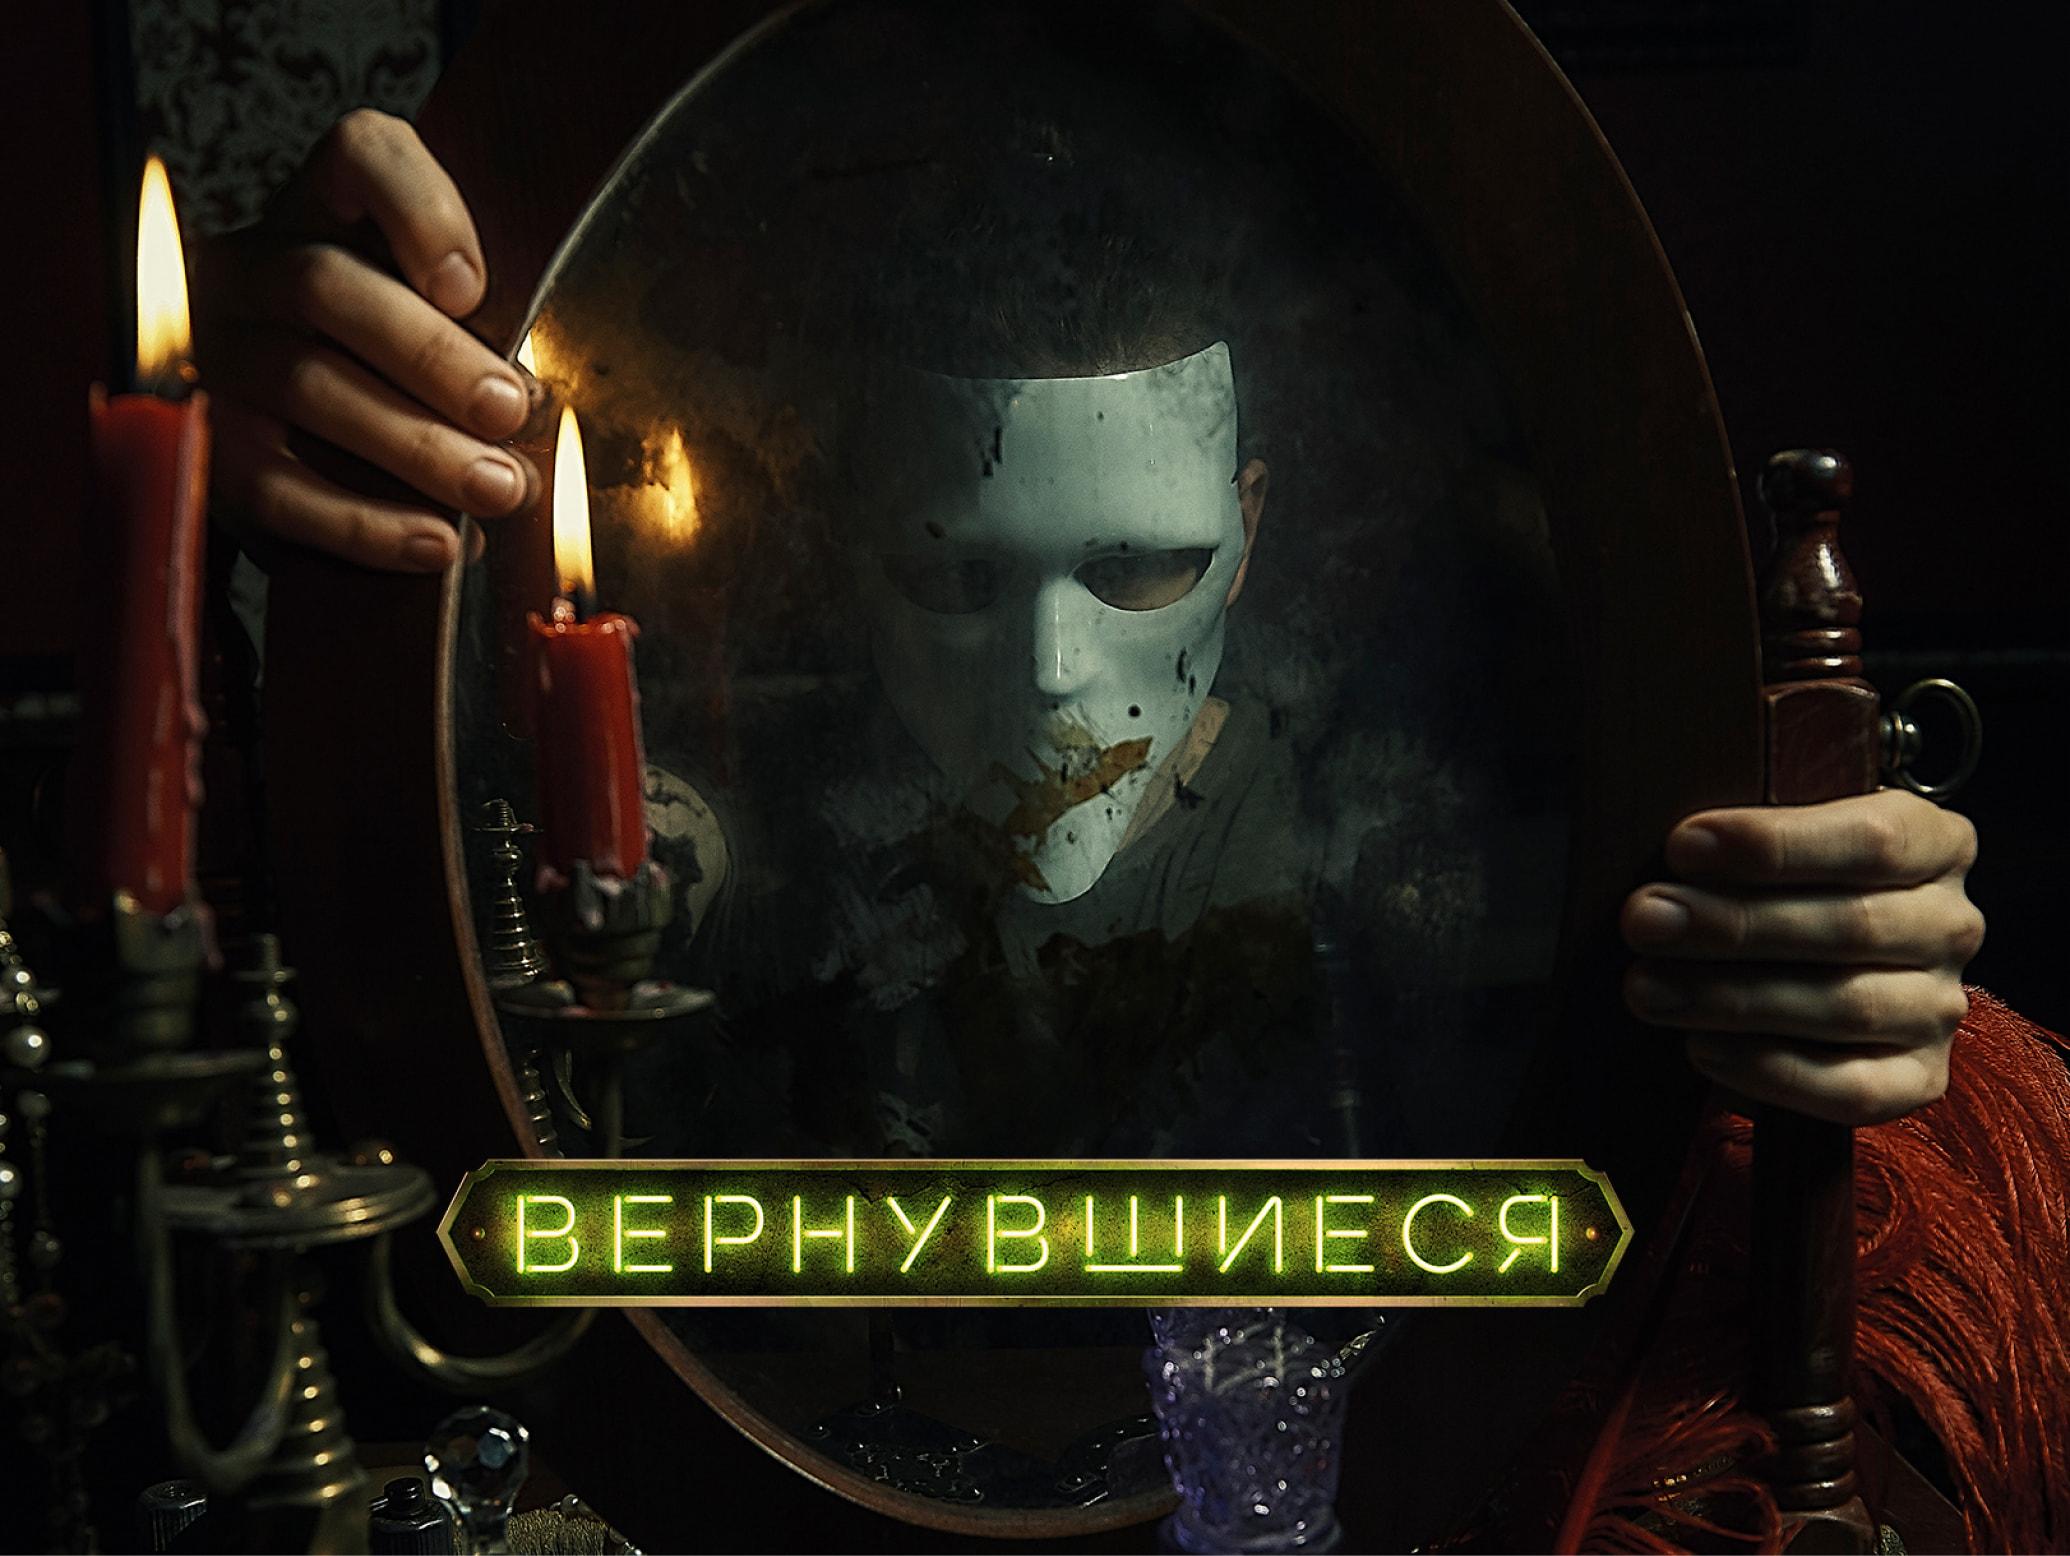 vernuvsh_01